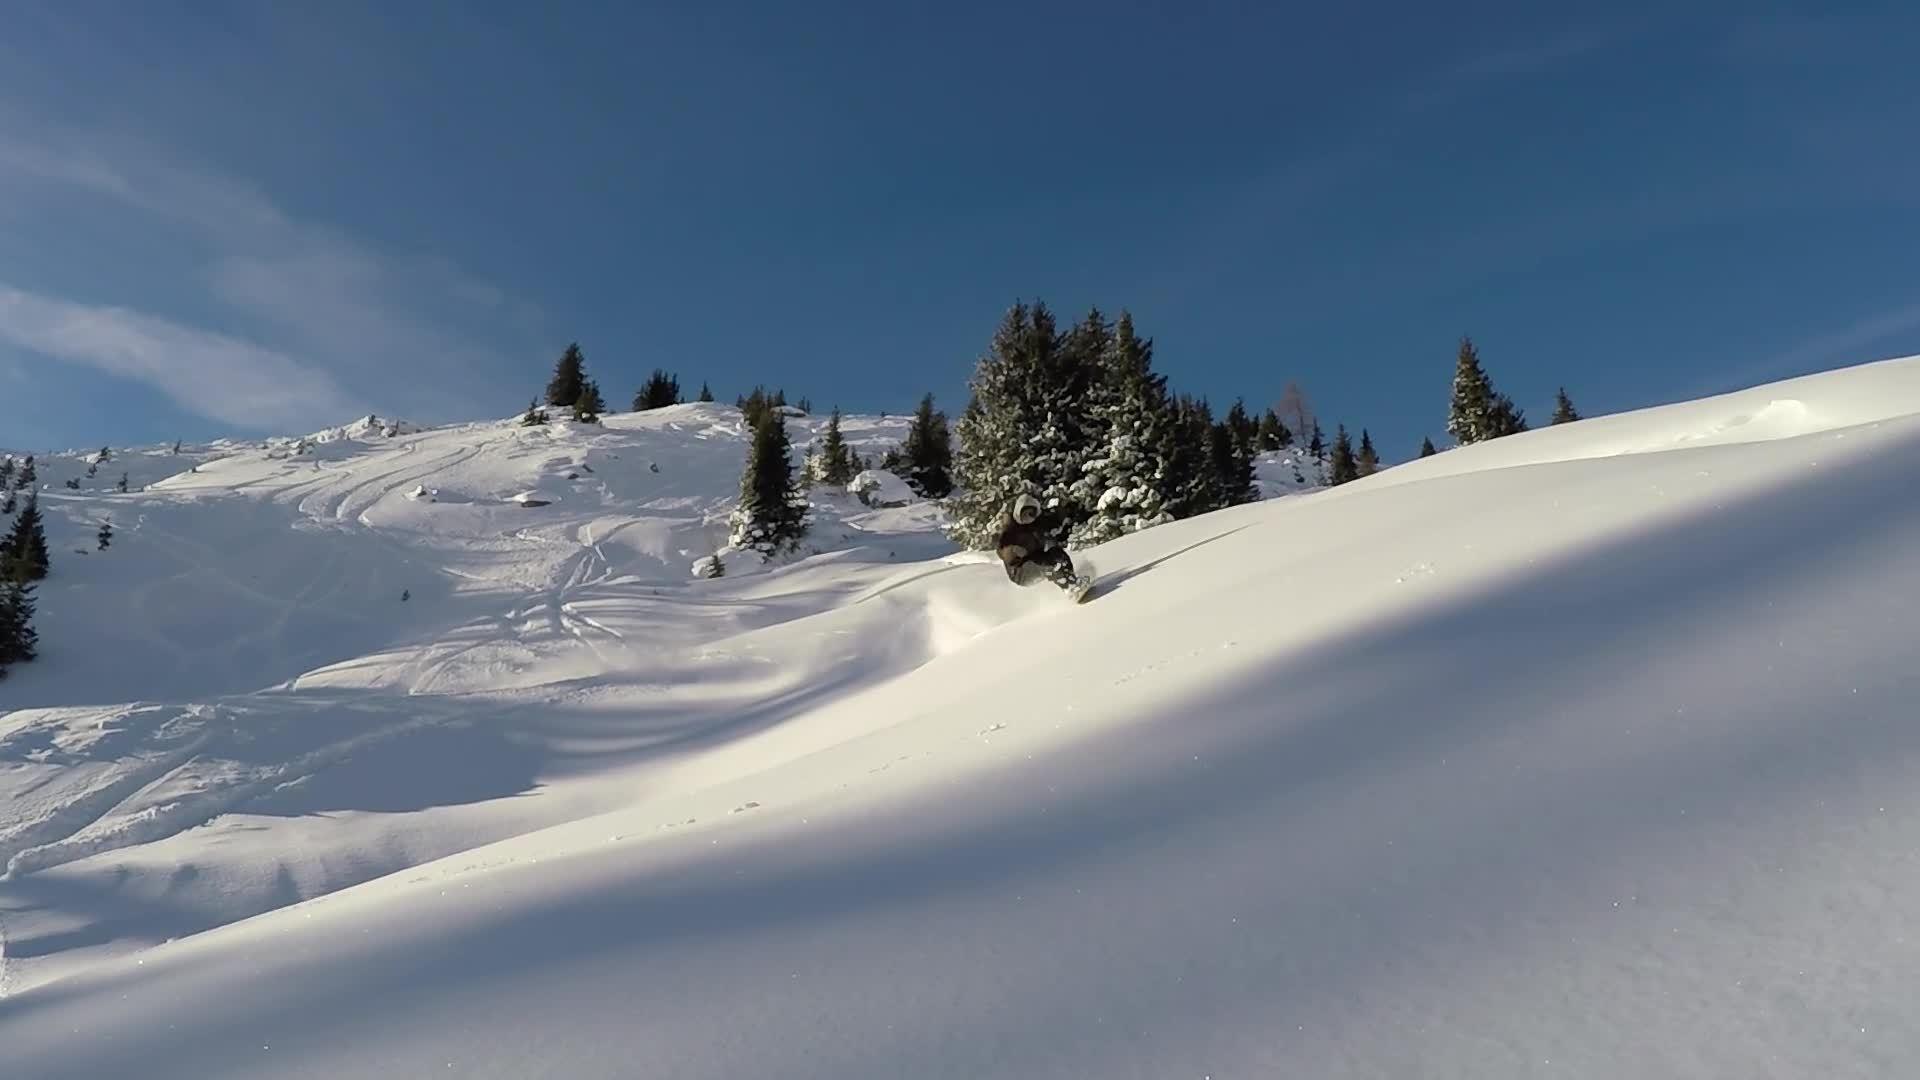 snowboard, snowboarding, sports, Stale Sandbech Pow Slash GIFs